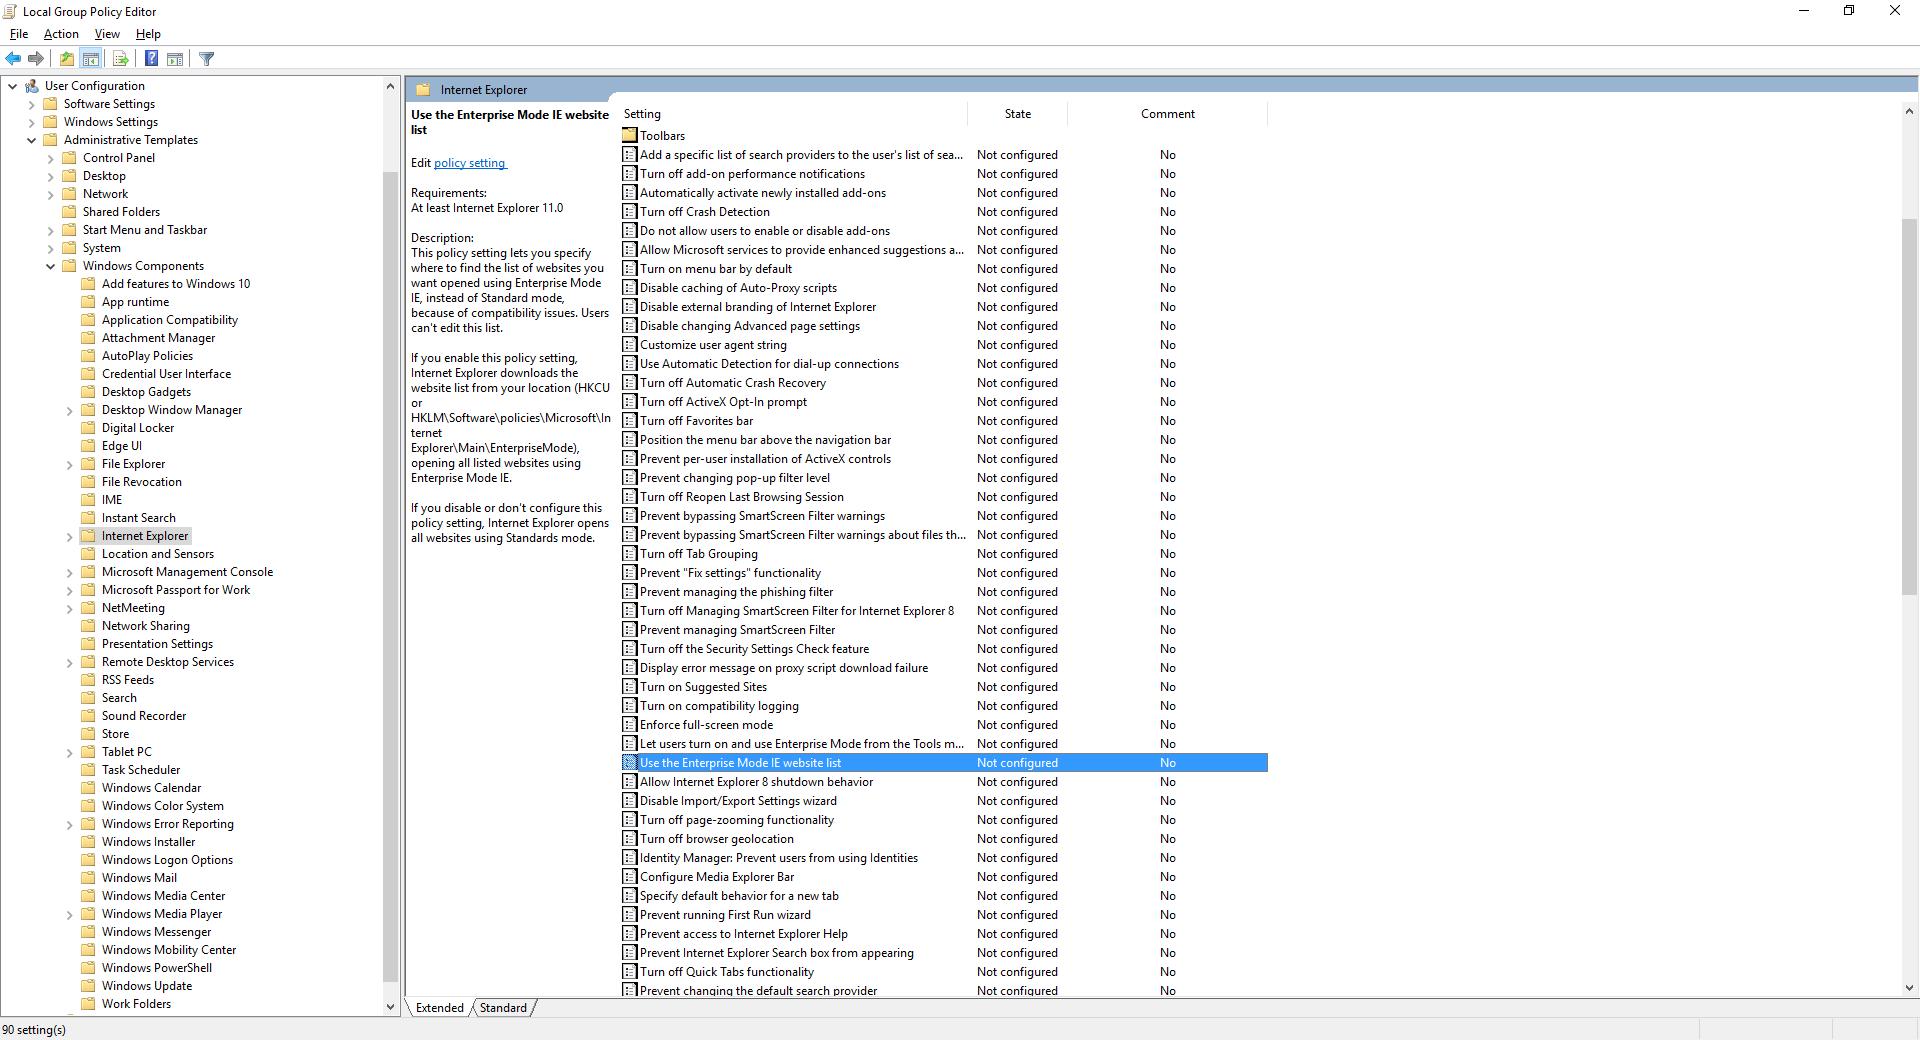 Running Siebel CRM on Non-Standard Versions of Internet Explorer